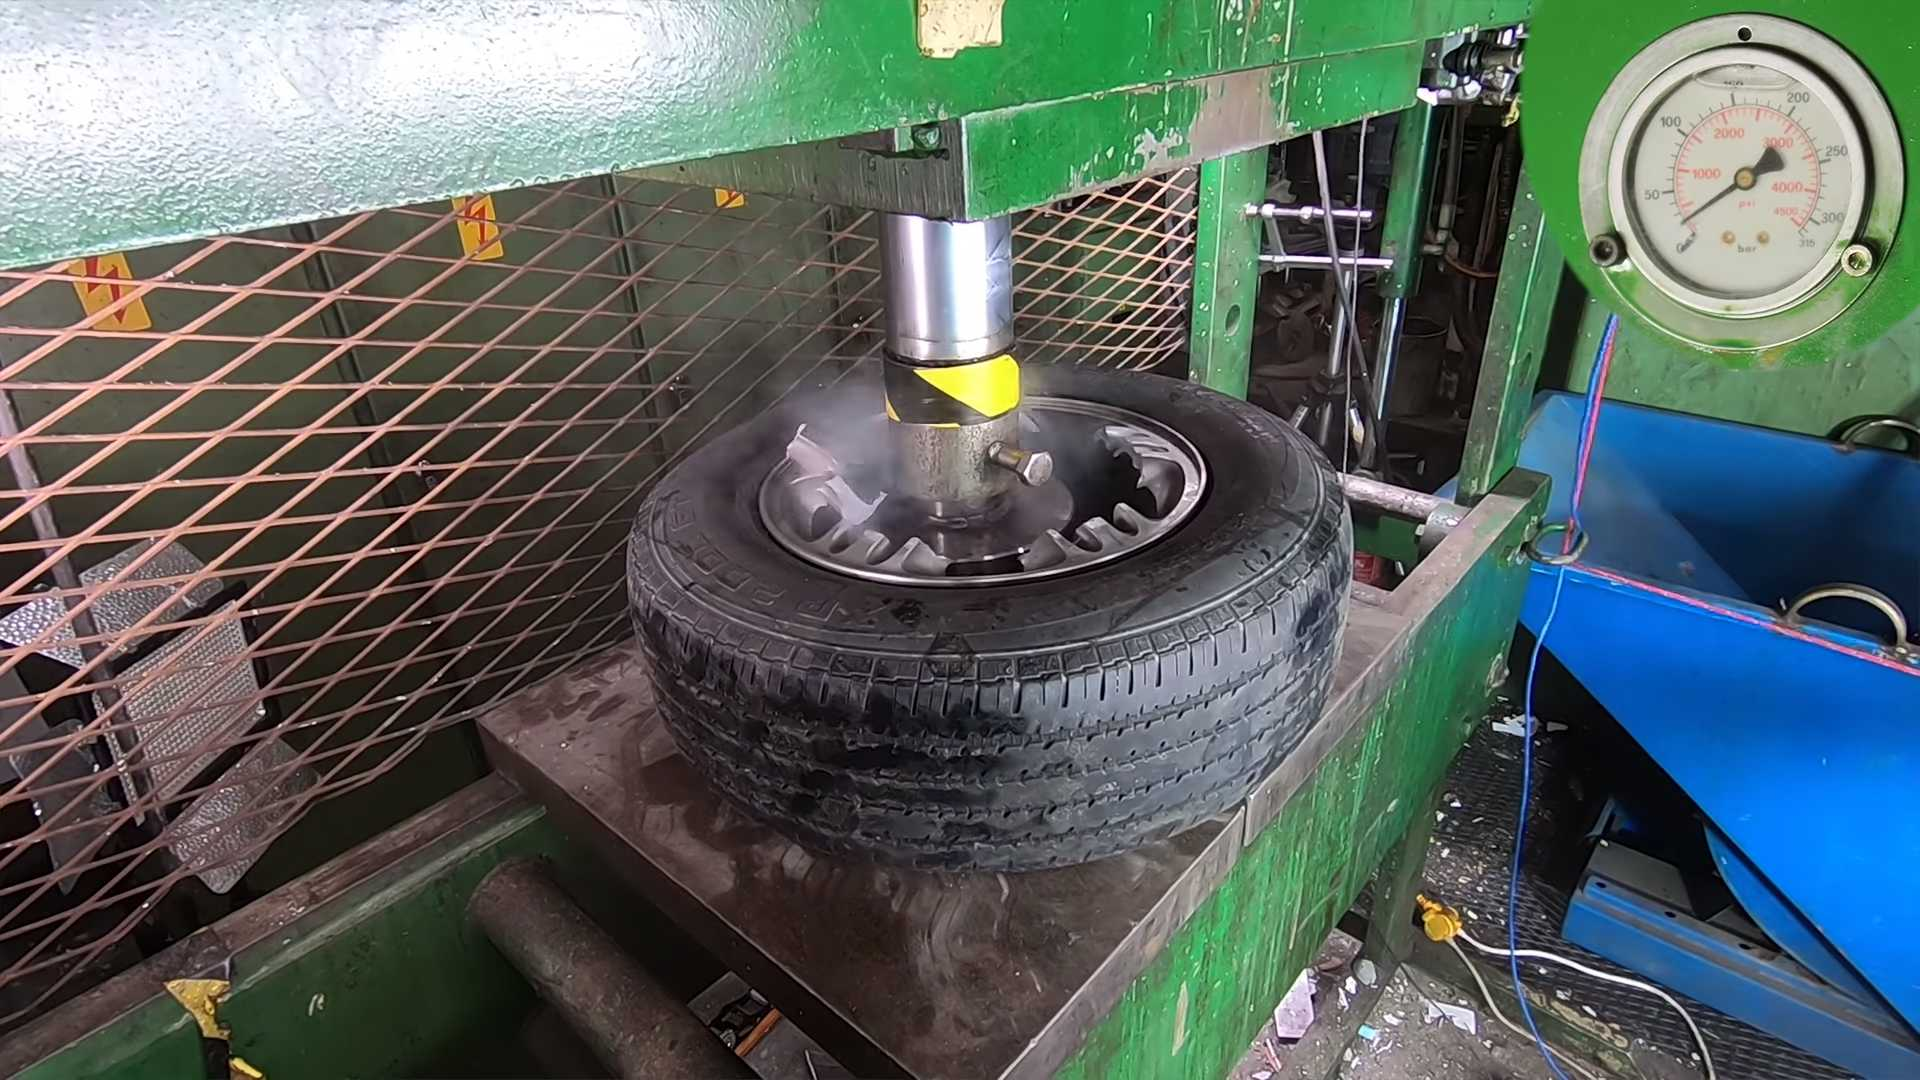 wheel-crushed-in-hydraulic-press-1 Ce fel de roata este mai rezistenta? Janta de otel vs janta de aliaj